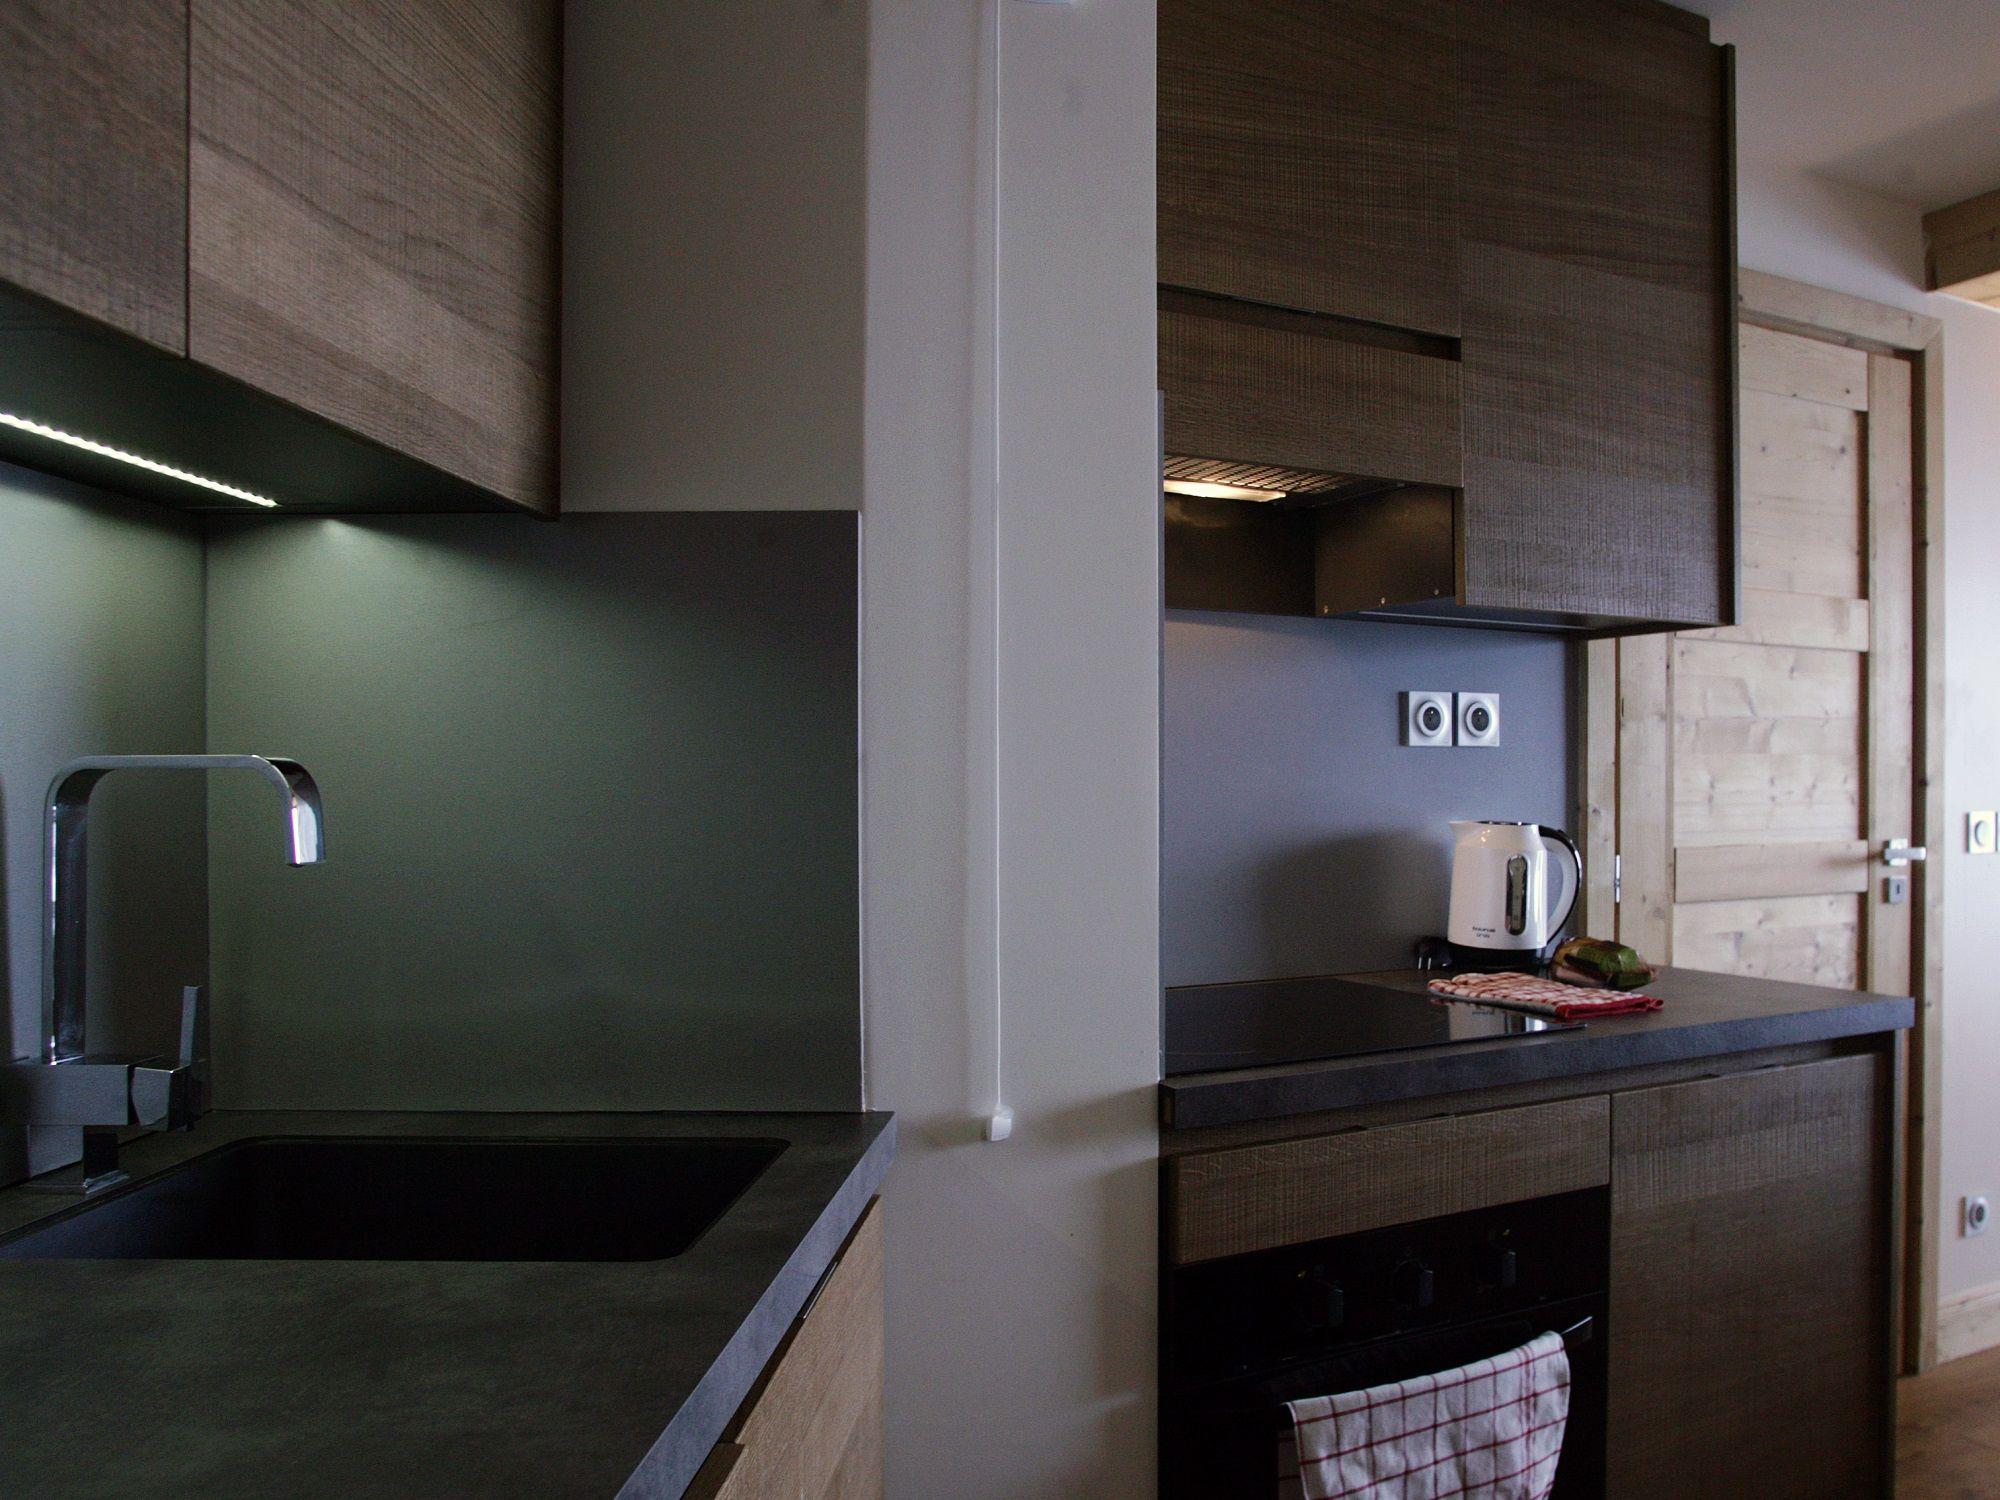 chalet-appartement-koh-i-nor-8-personen